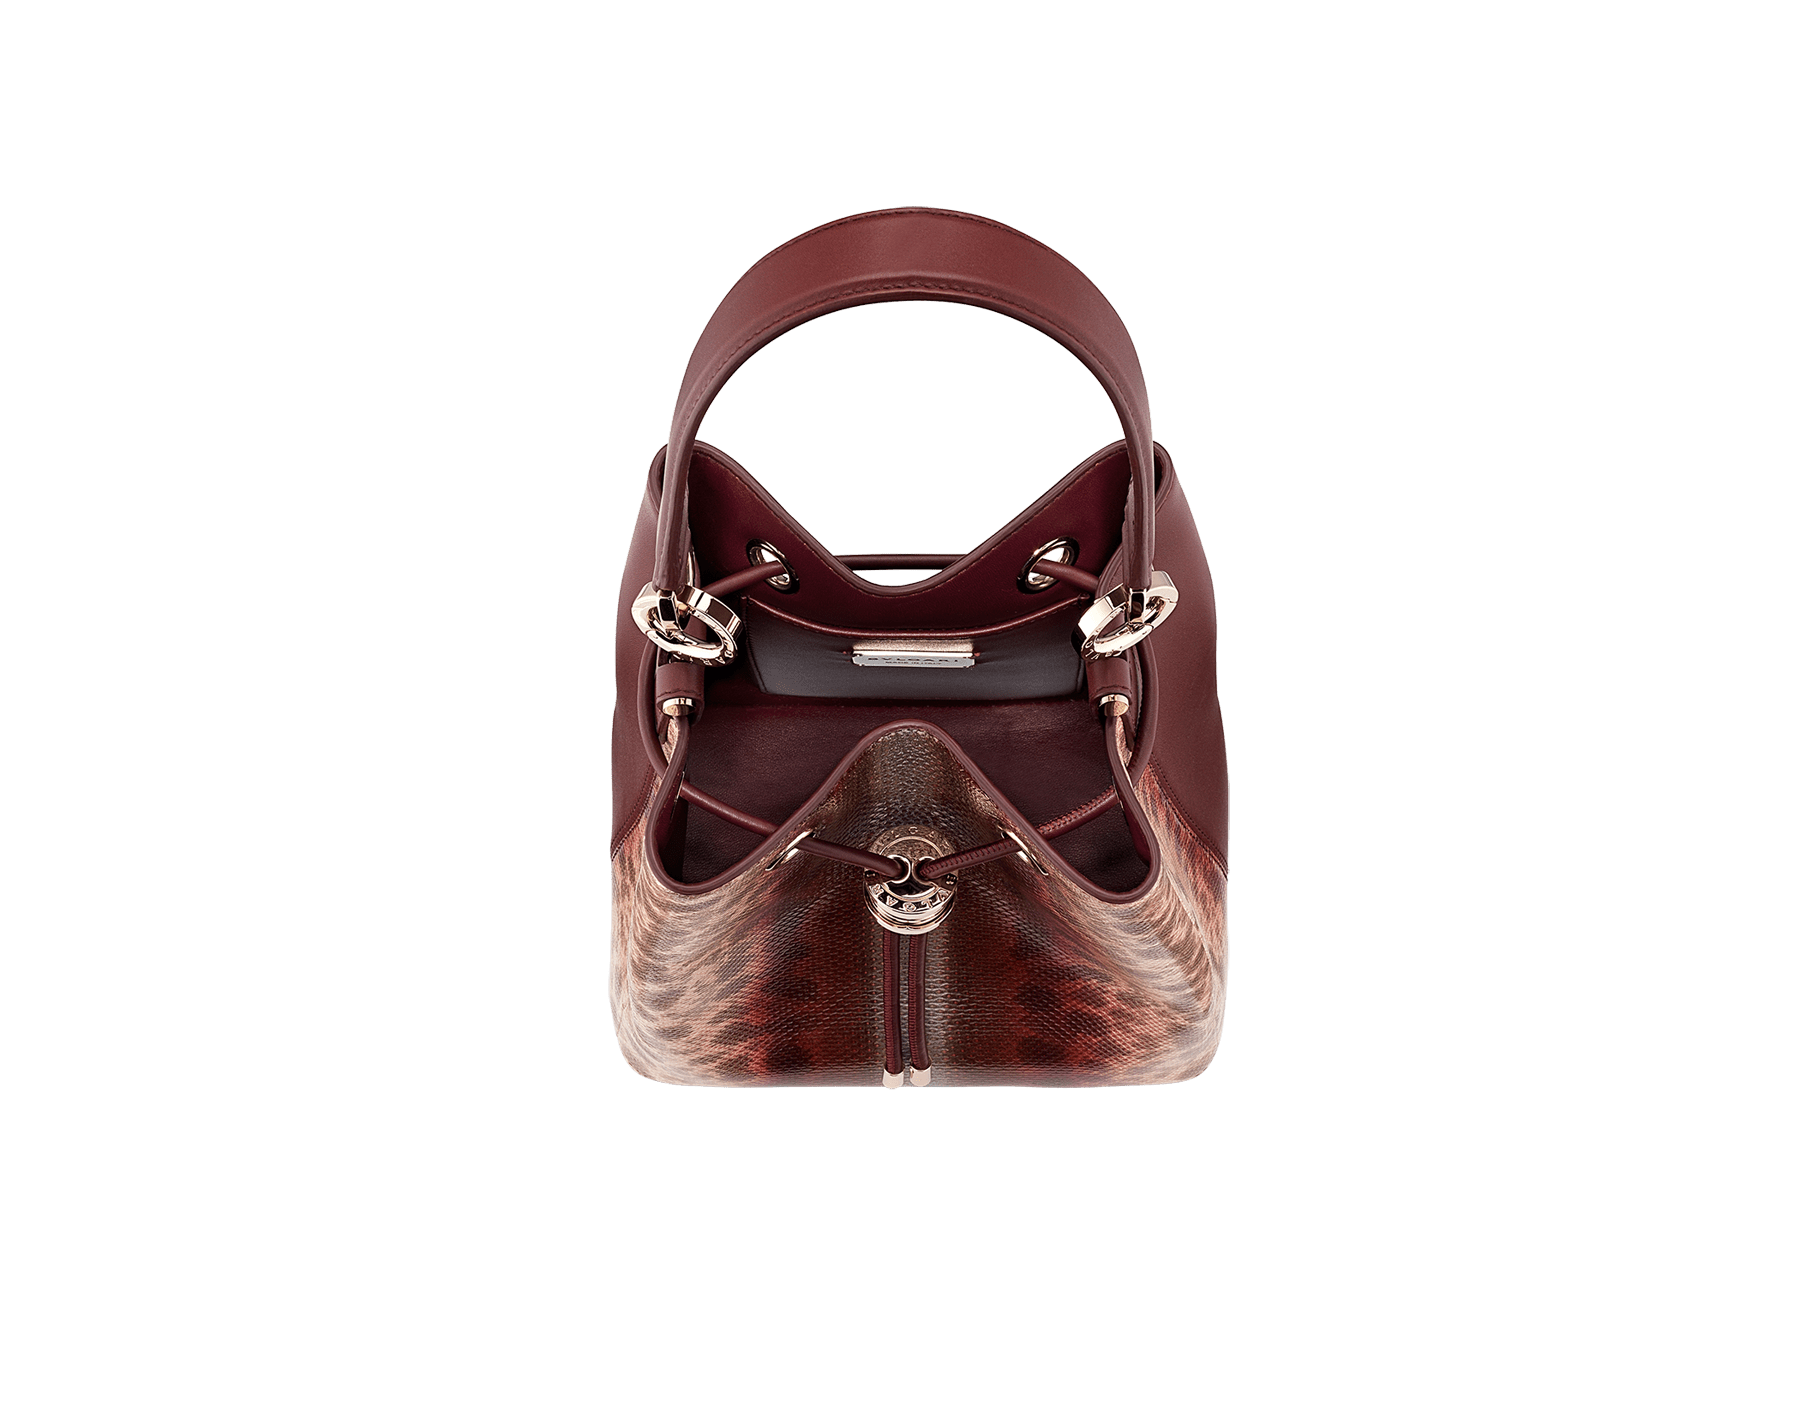 Bucket B.zero1 in rosa di francia Sahara karung skin and Roman garnet smooth calf leather with a Roman garnet nappa interior. Hardware in light gold plated brass, featuring B.zero1 décor. 289002 image 4